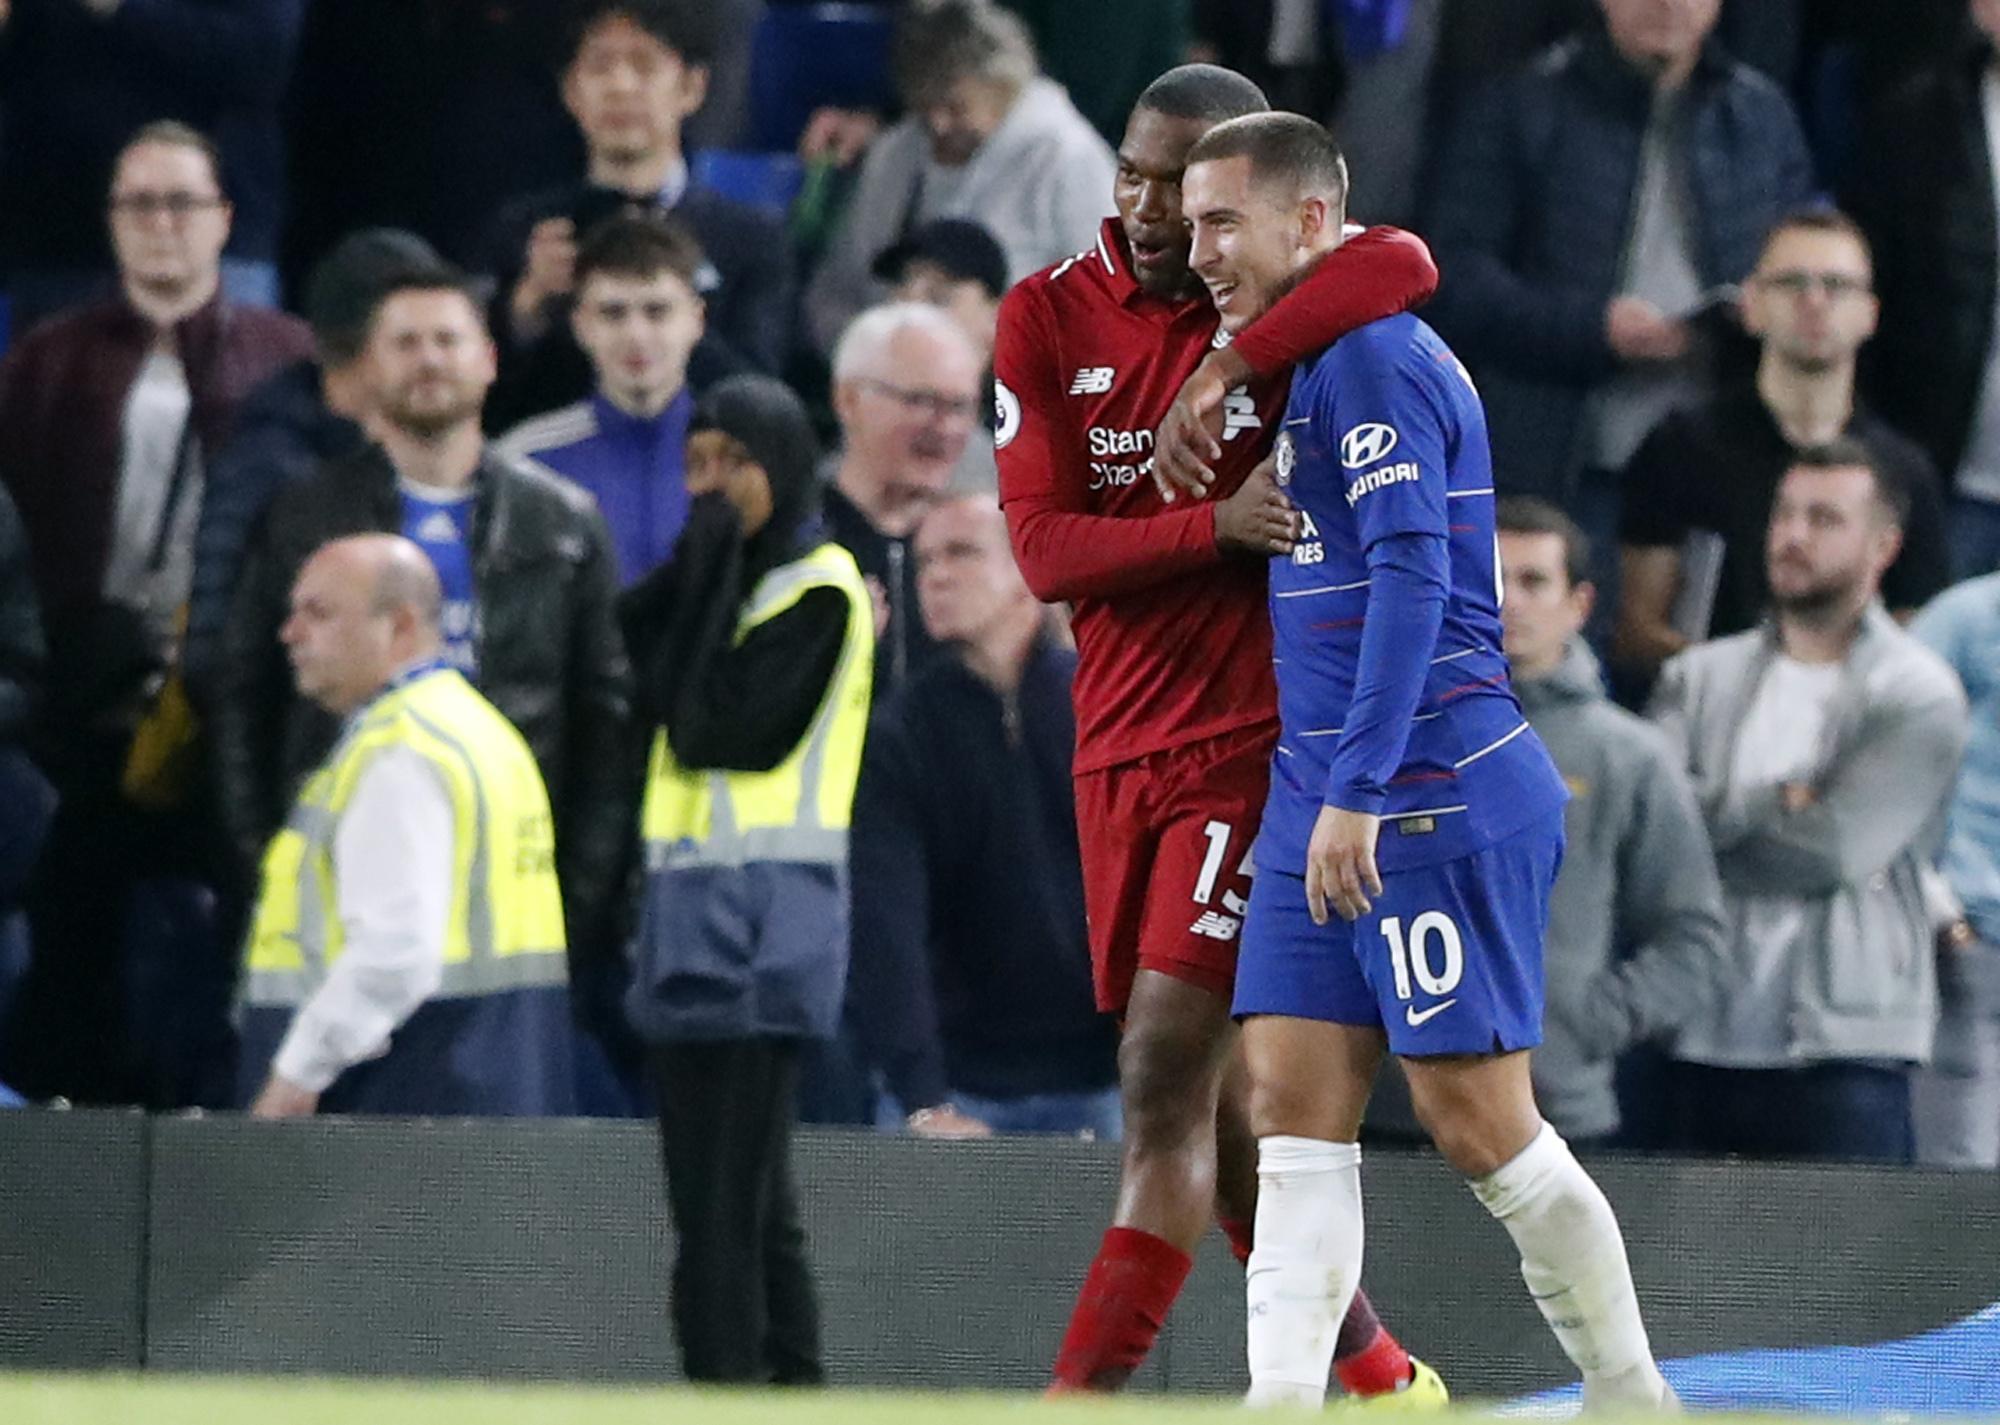 Eden Hazard had some words for Daniel Sturridge after his stunning equaliser